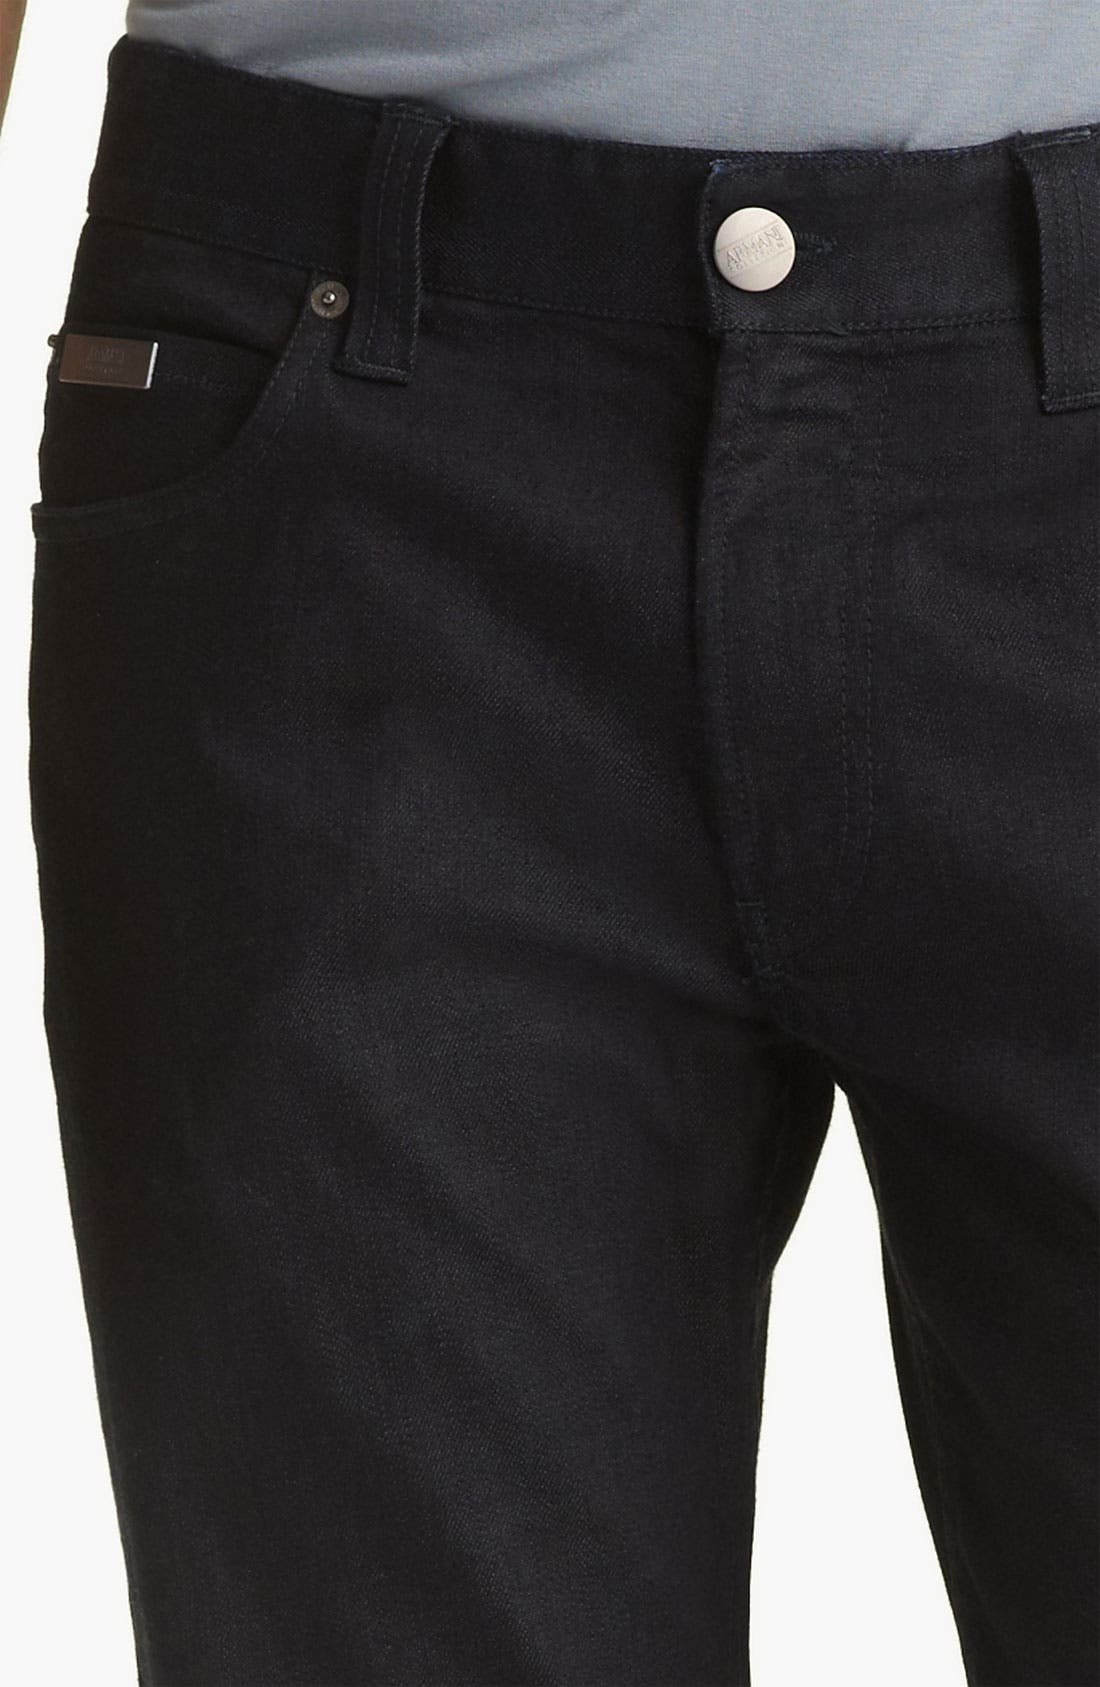 Alternate Image 3  - Armani Collezioni Slim Straight Leg Jeans (Indigo Dark Rinse)